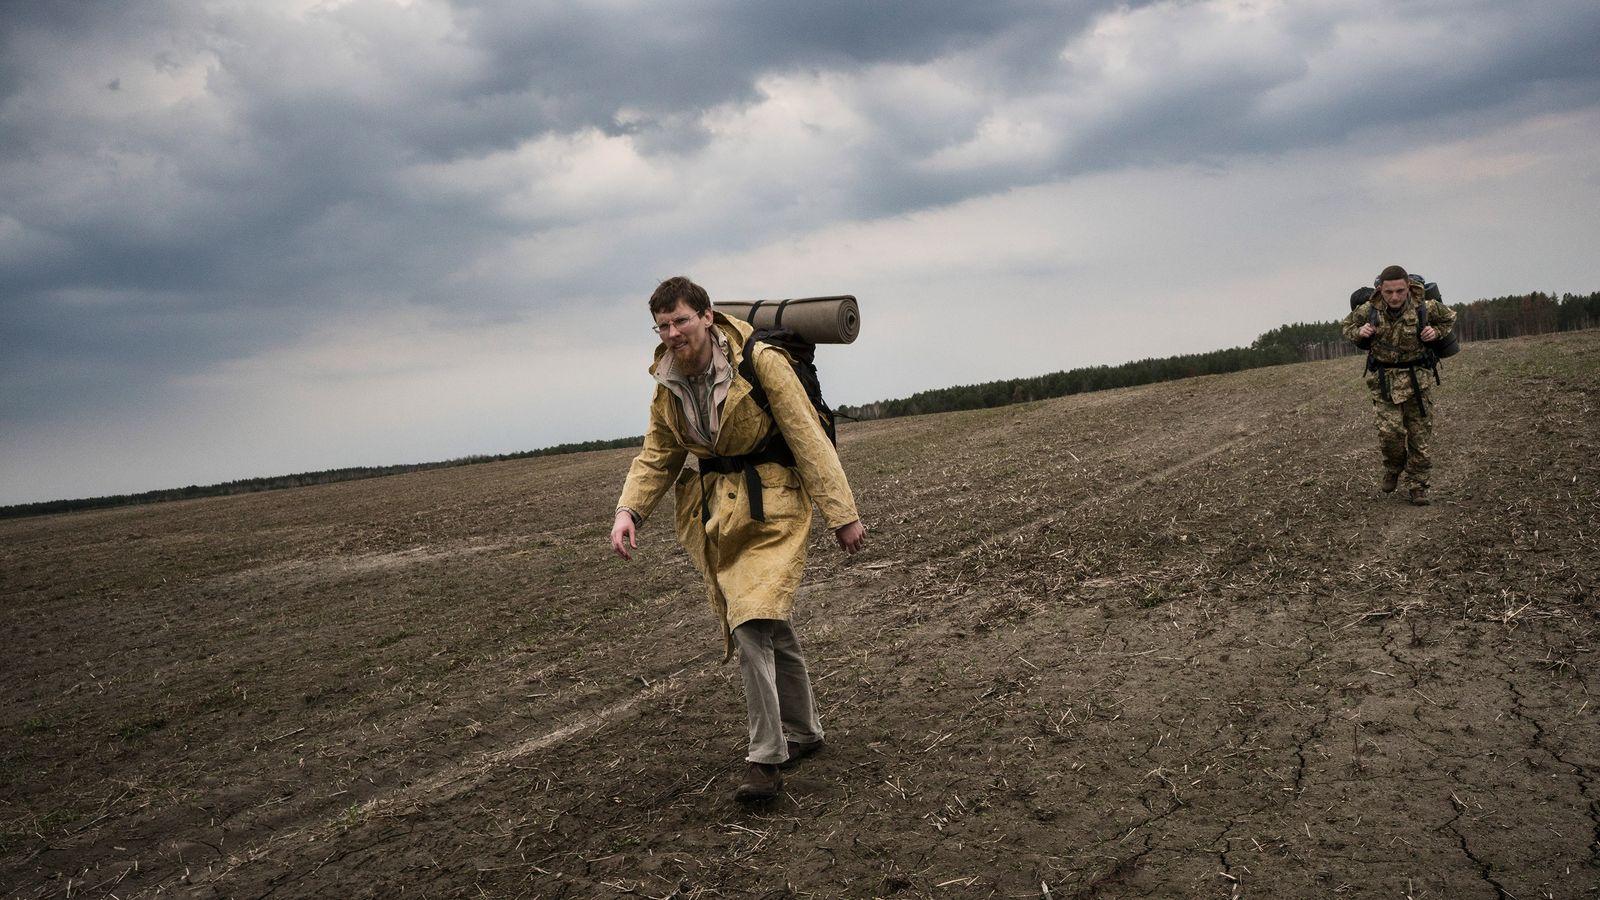 zona-de-exclusao-zona-morta-chernobyl-ucrania